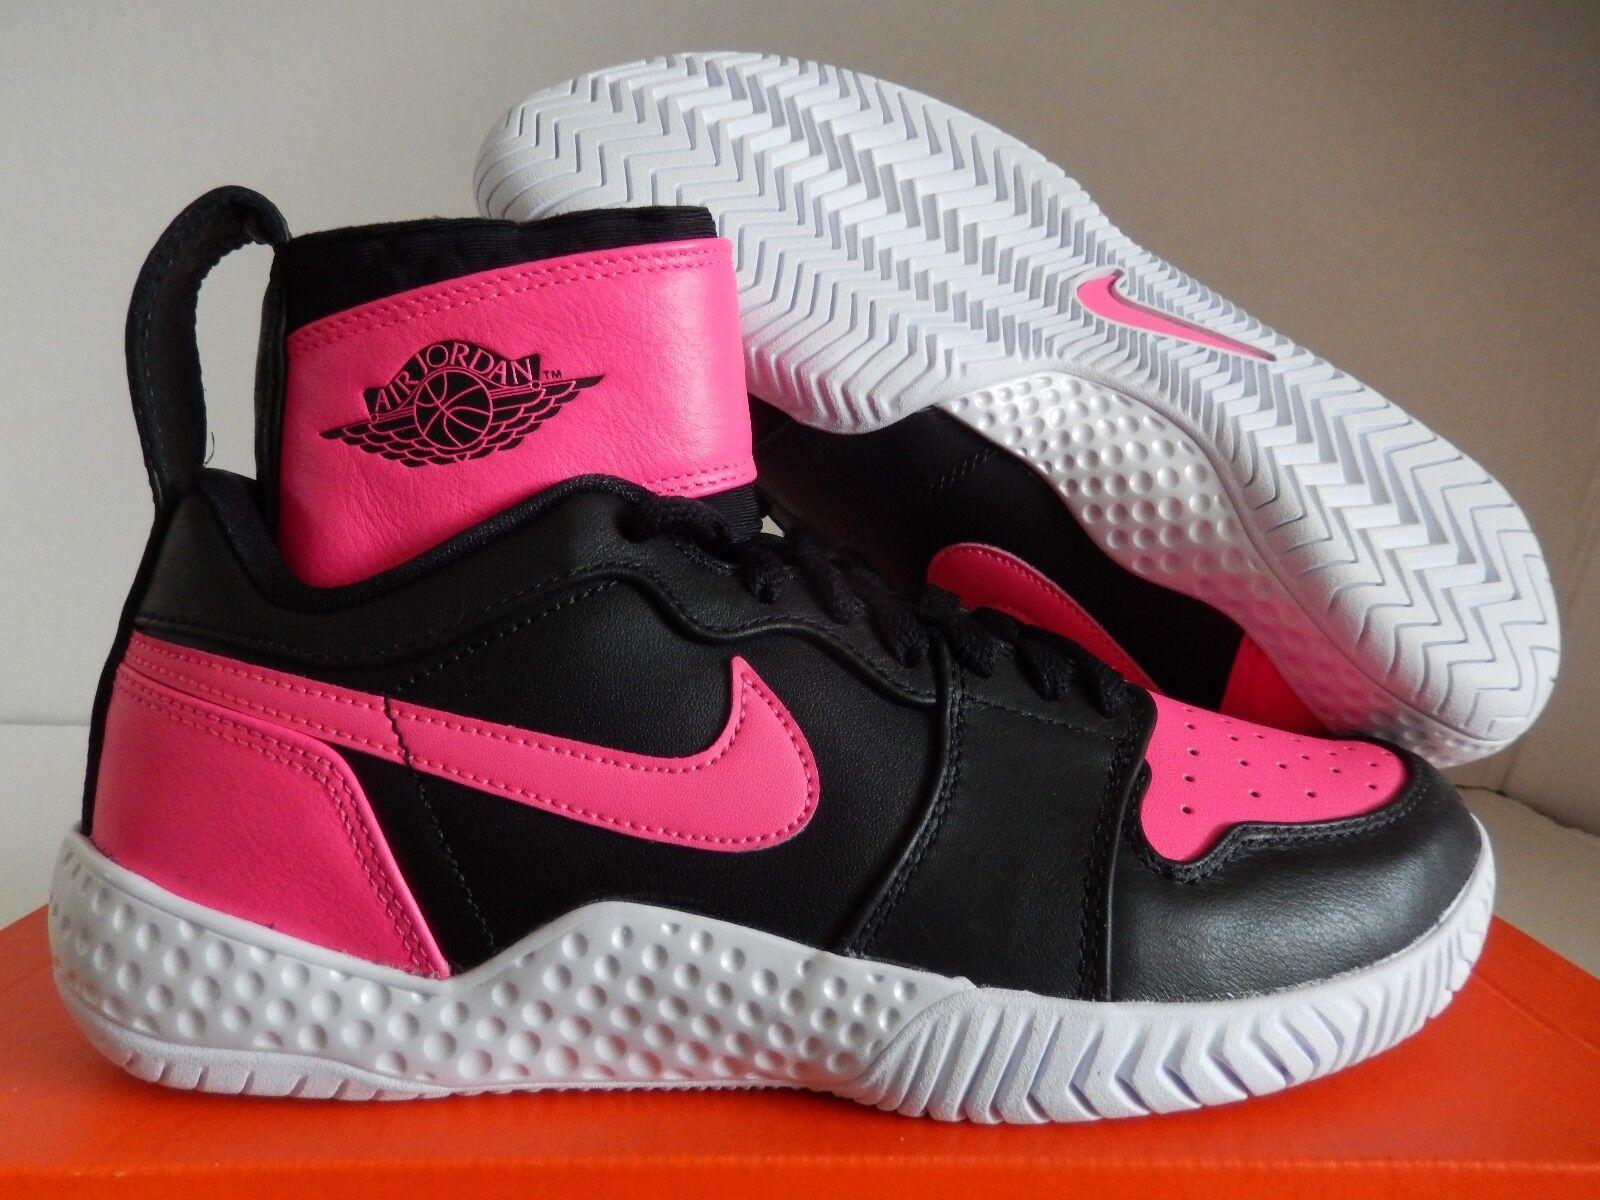 Nike FLARE grandes Qs AJ1 Jordan Serena Serena Serena Williams NEGRO-HYPER rosado Talla 6.5  venta al por mayor barato